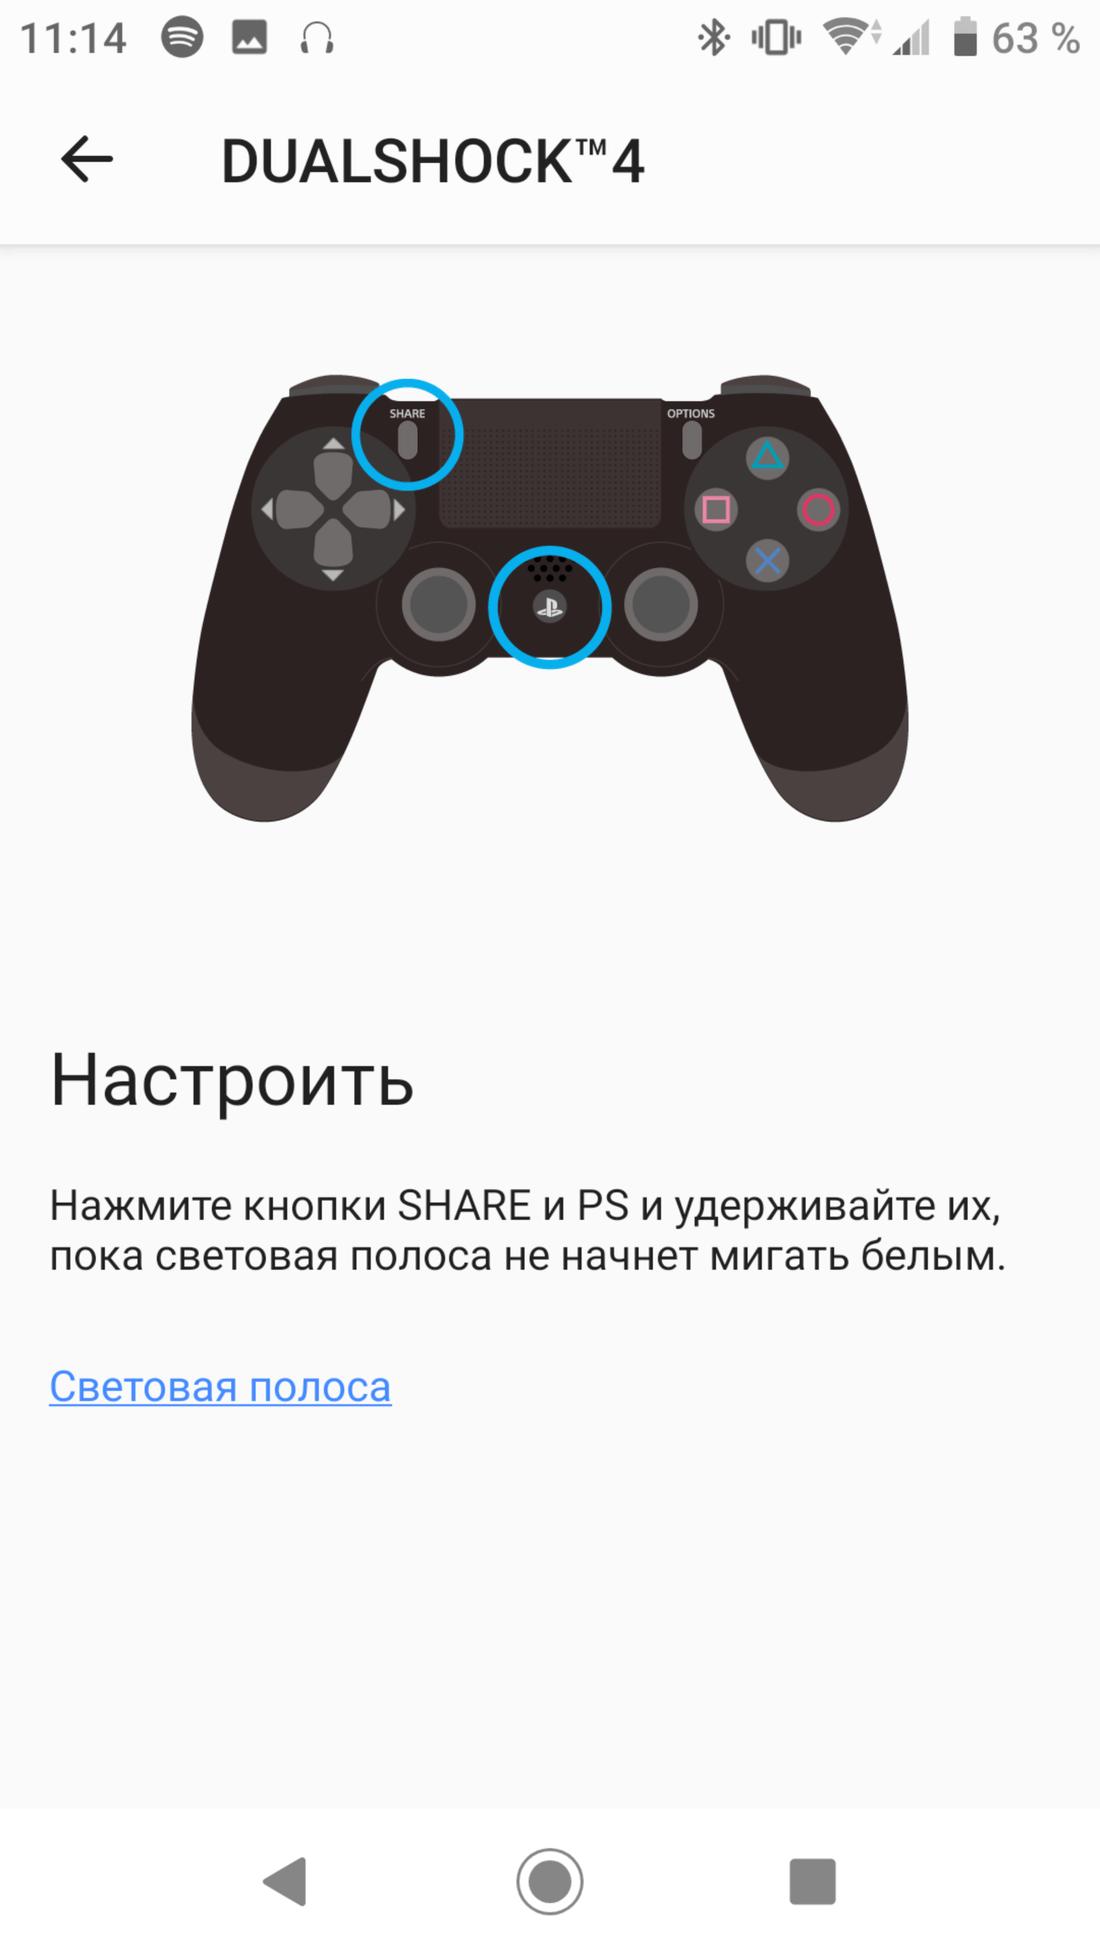 Скриншот #4 из программы PS4 Remote Play